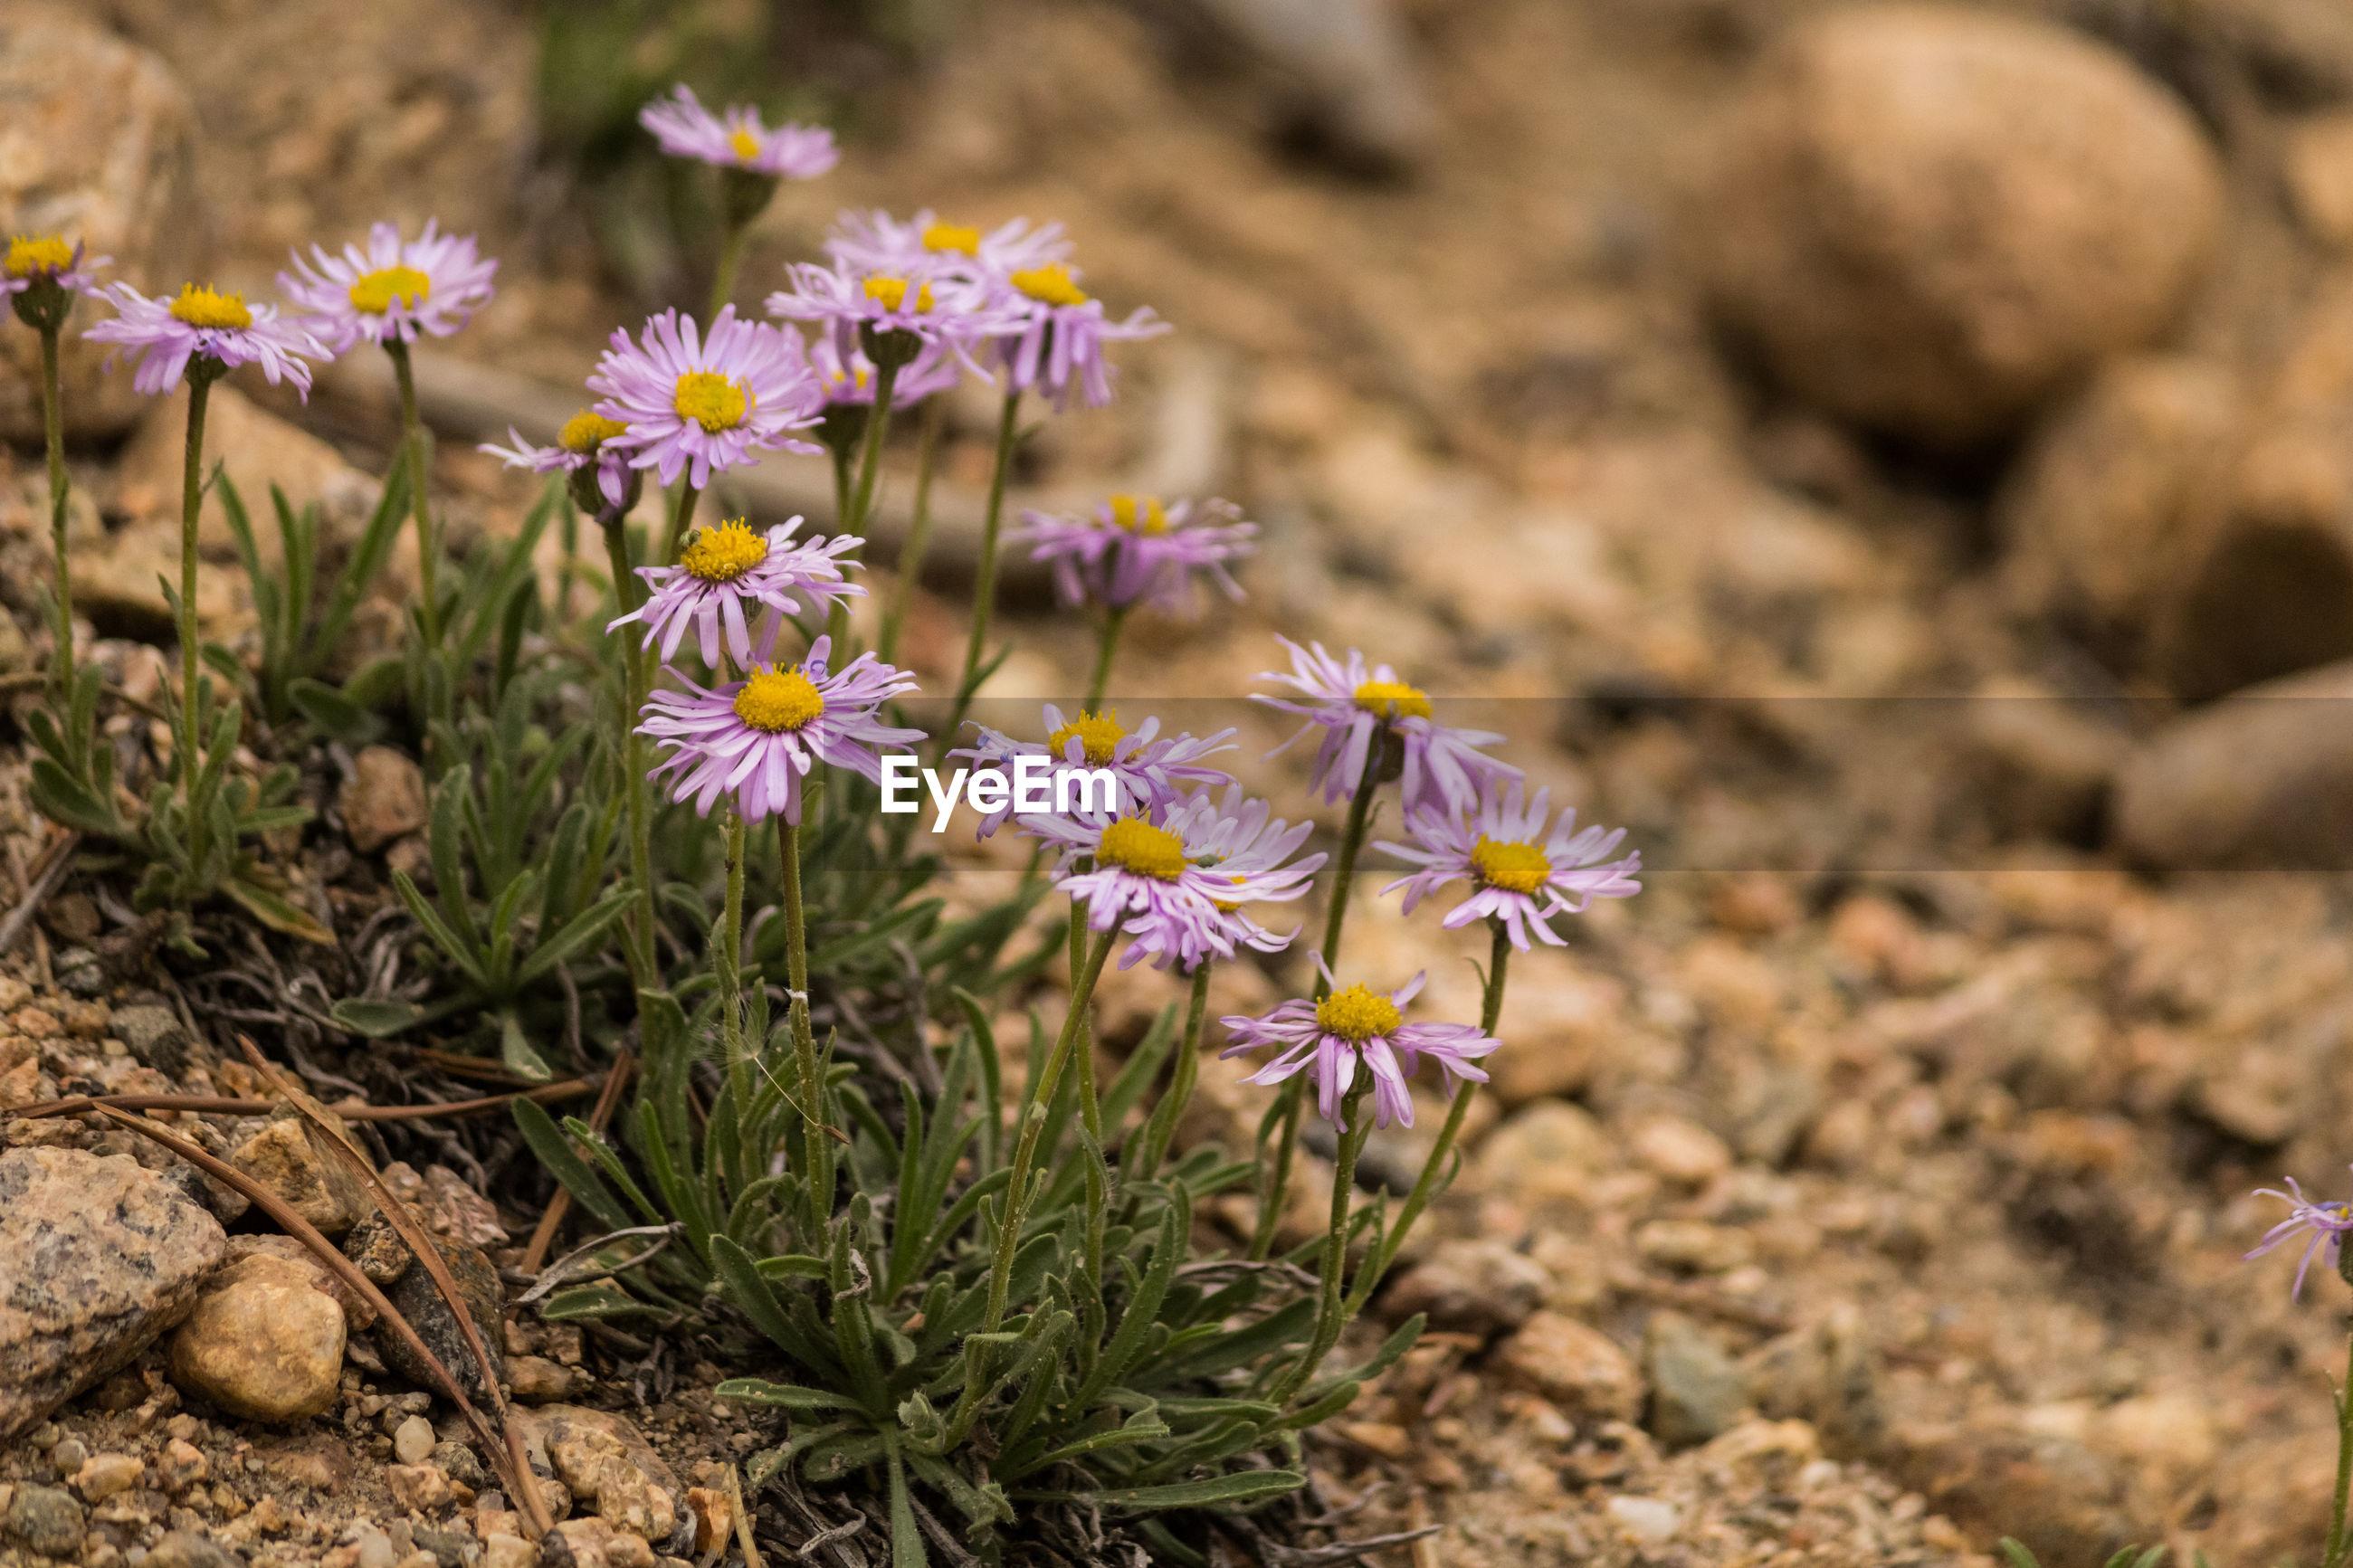 CLOSE-UP OF CROCUS FLOWERS ON FIELD